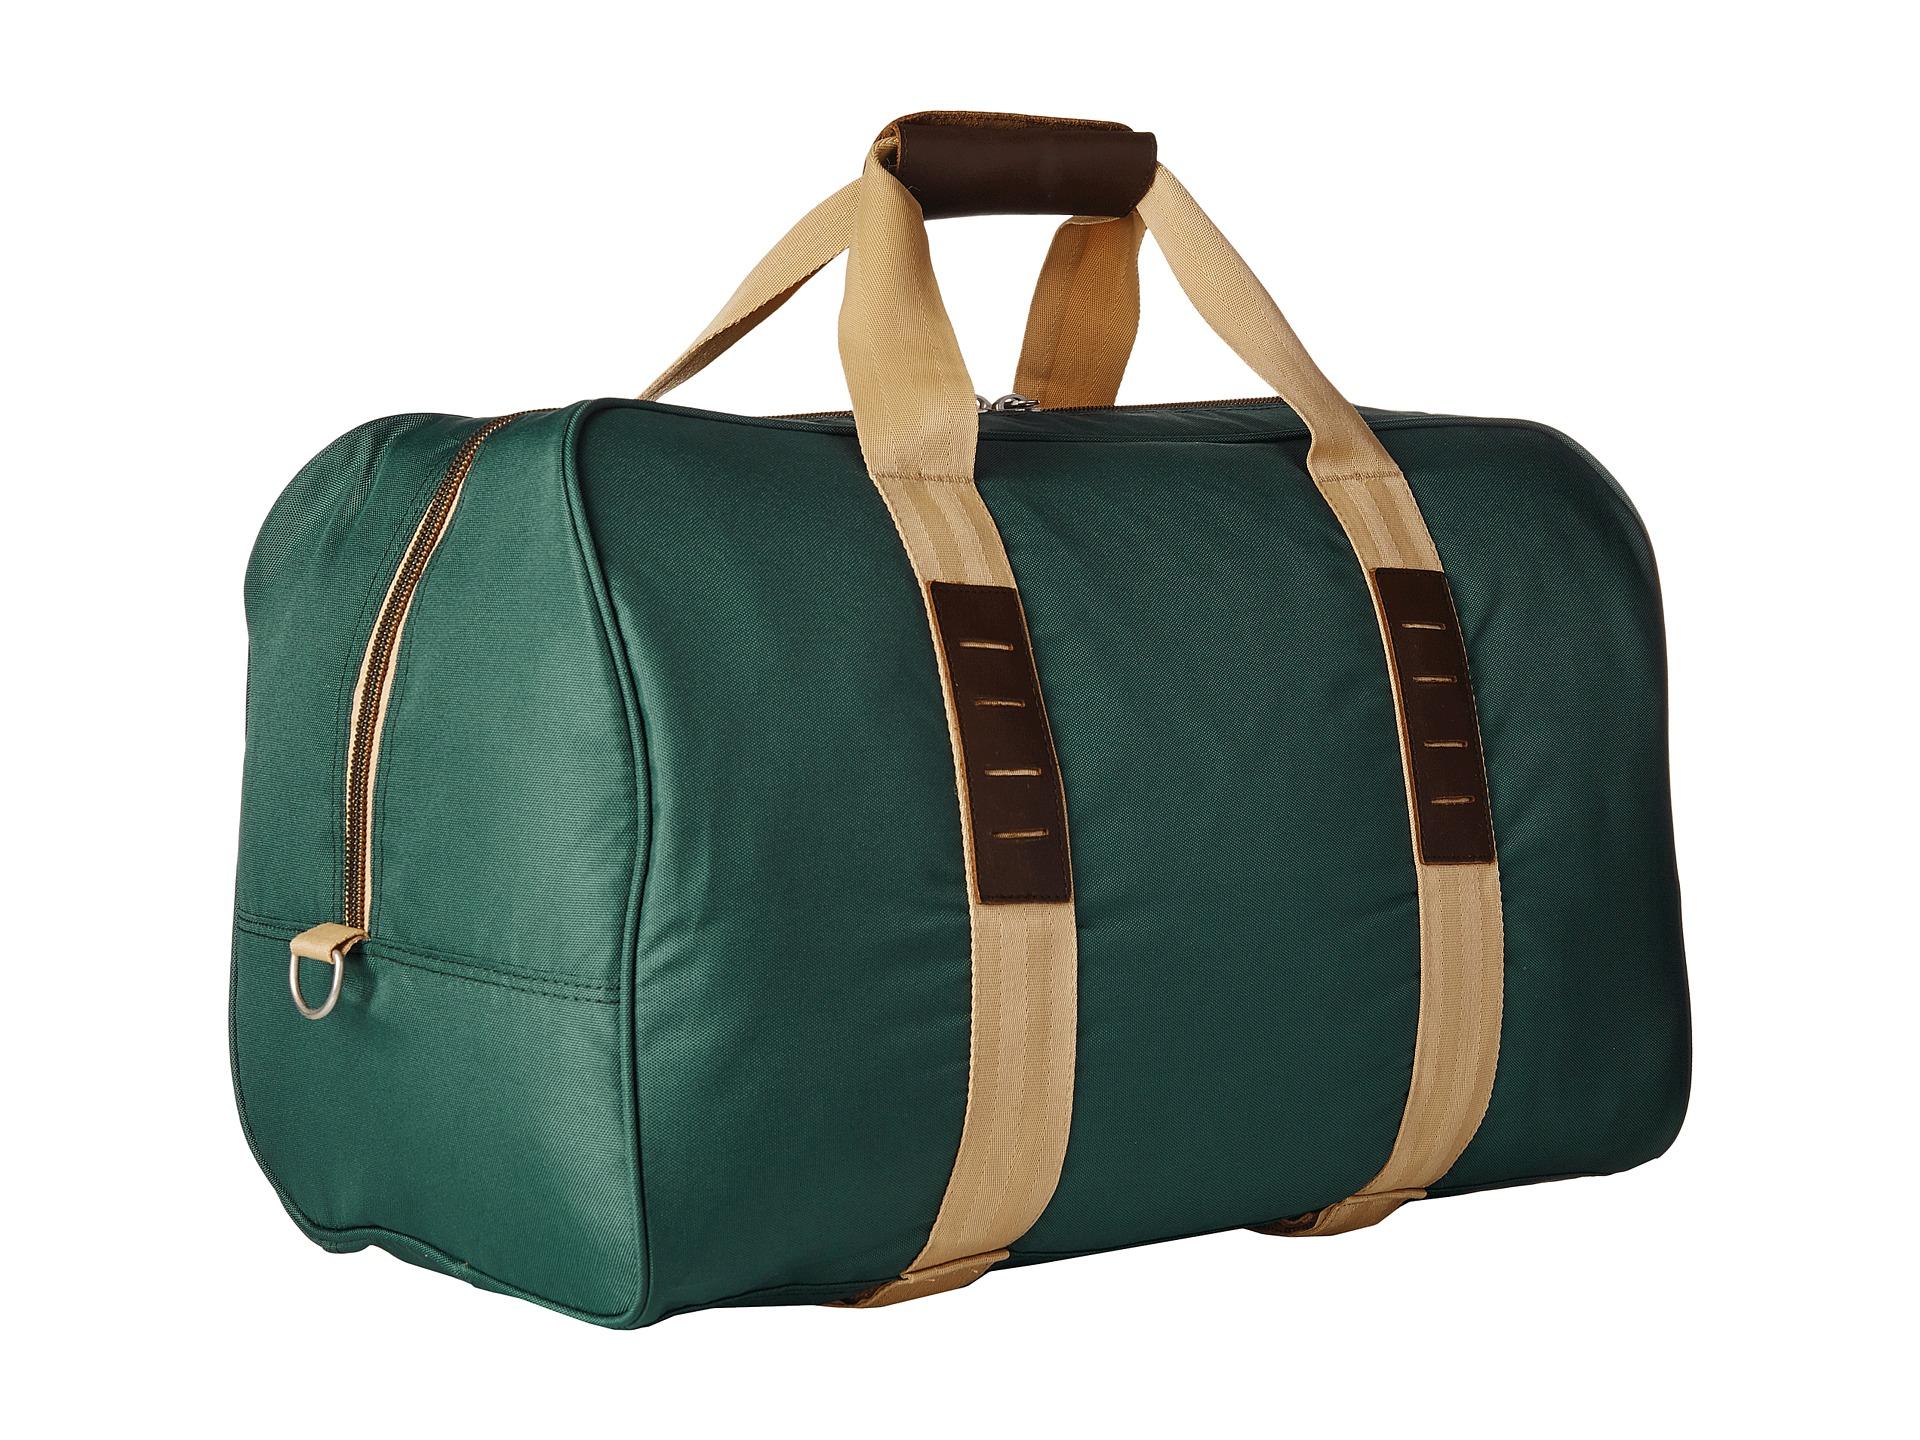 Seatbelt Bag Review   Gadget Flow